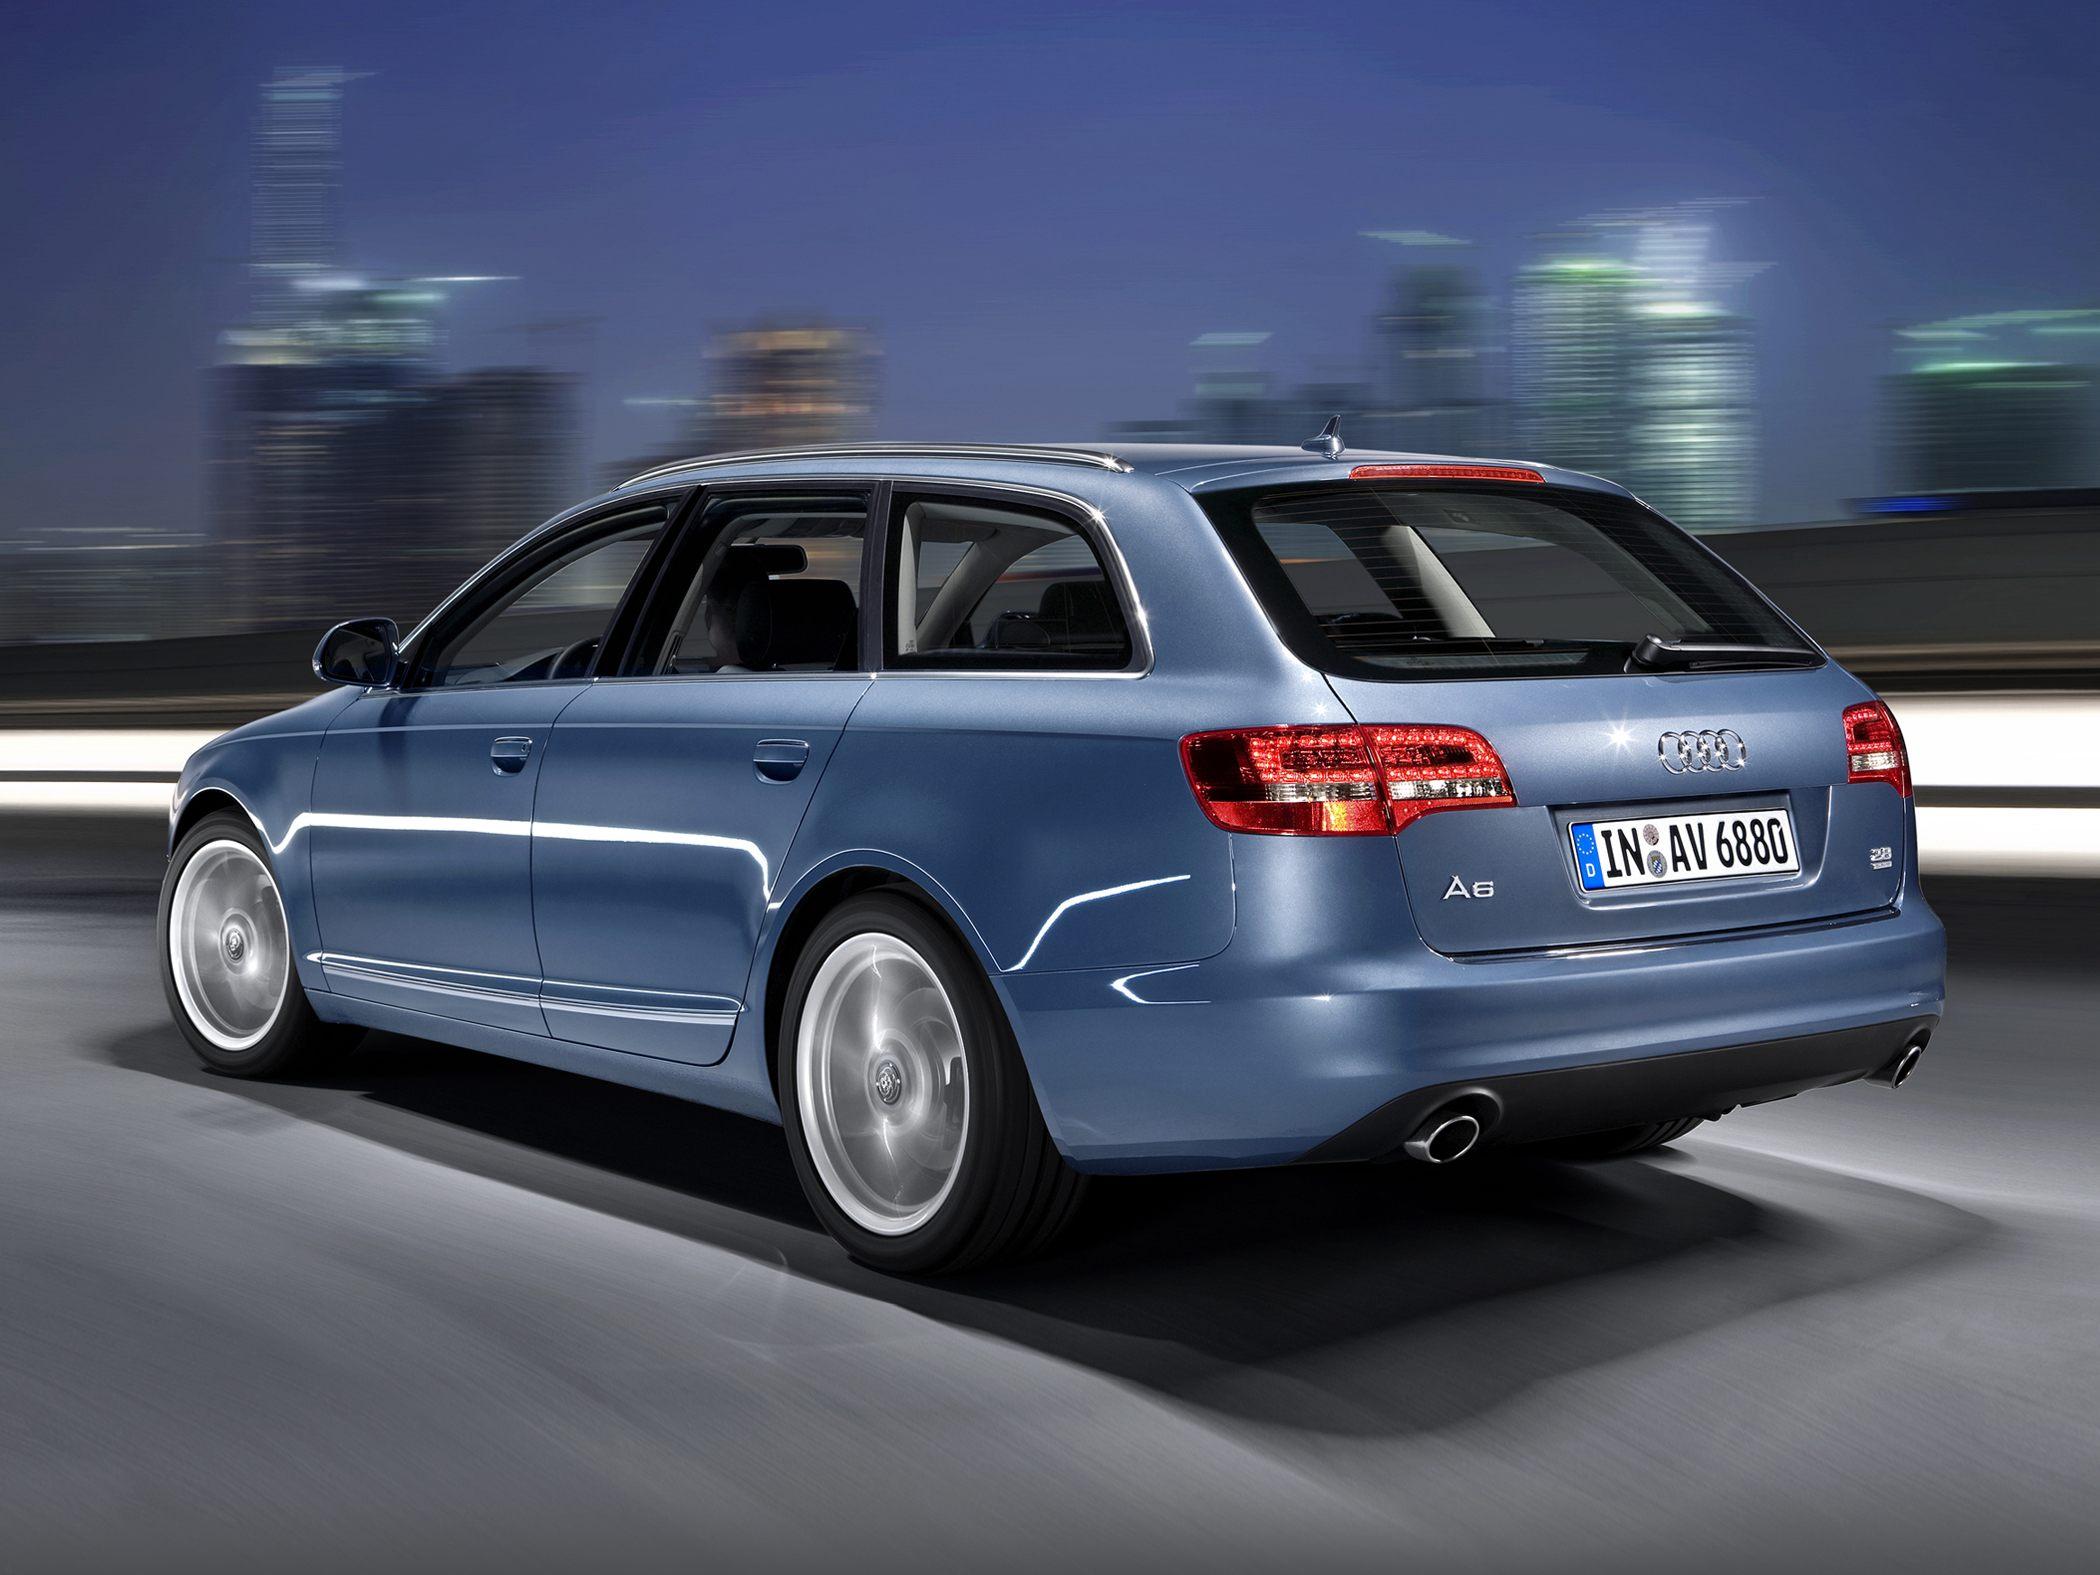 Index Of Dataimagesgalleryesaudiawagon - Audi a6 wagon